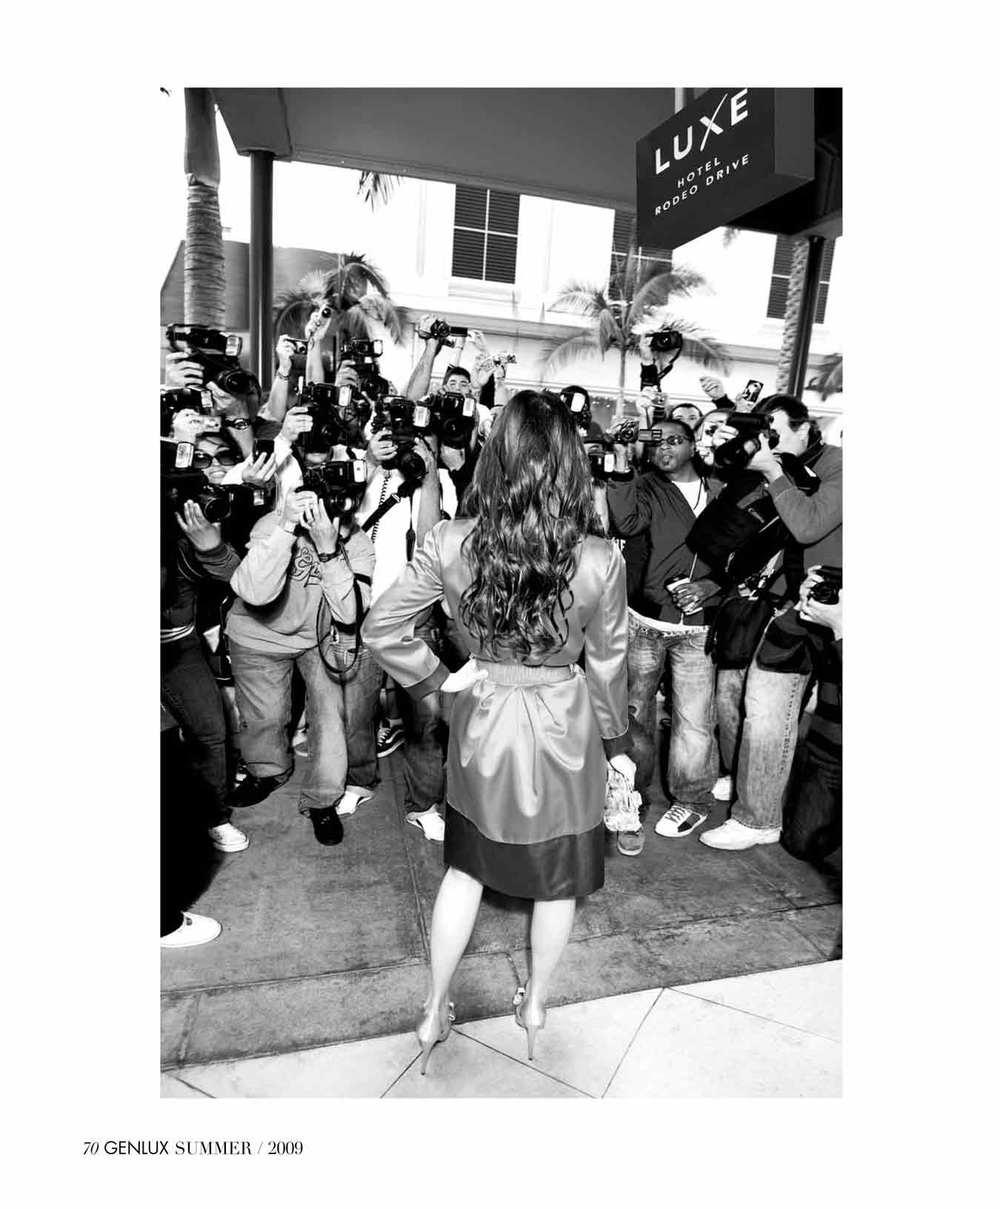 kim_kardashian_luxe_hotel